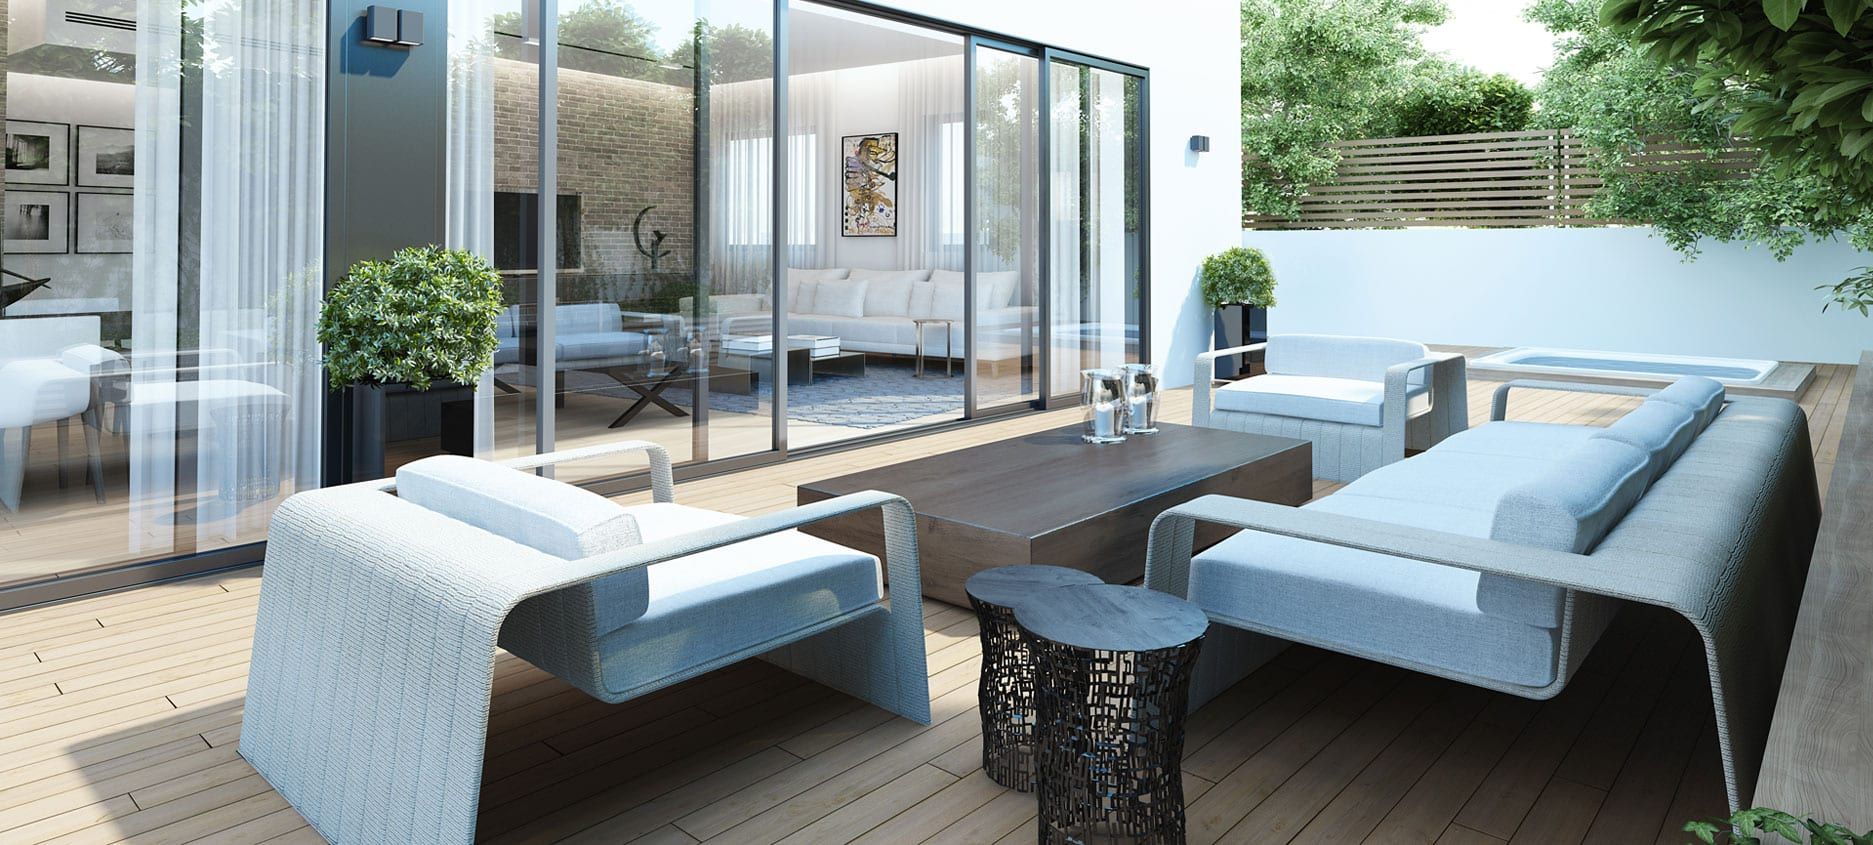 Oak typical b ando studio for Living room ideas uk 2013